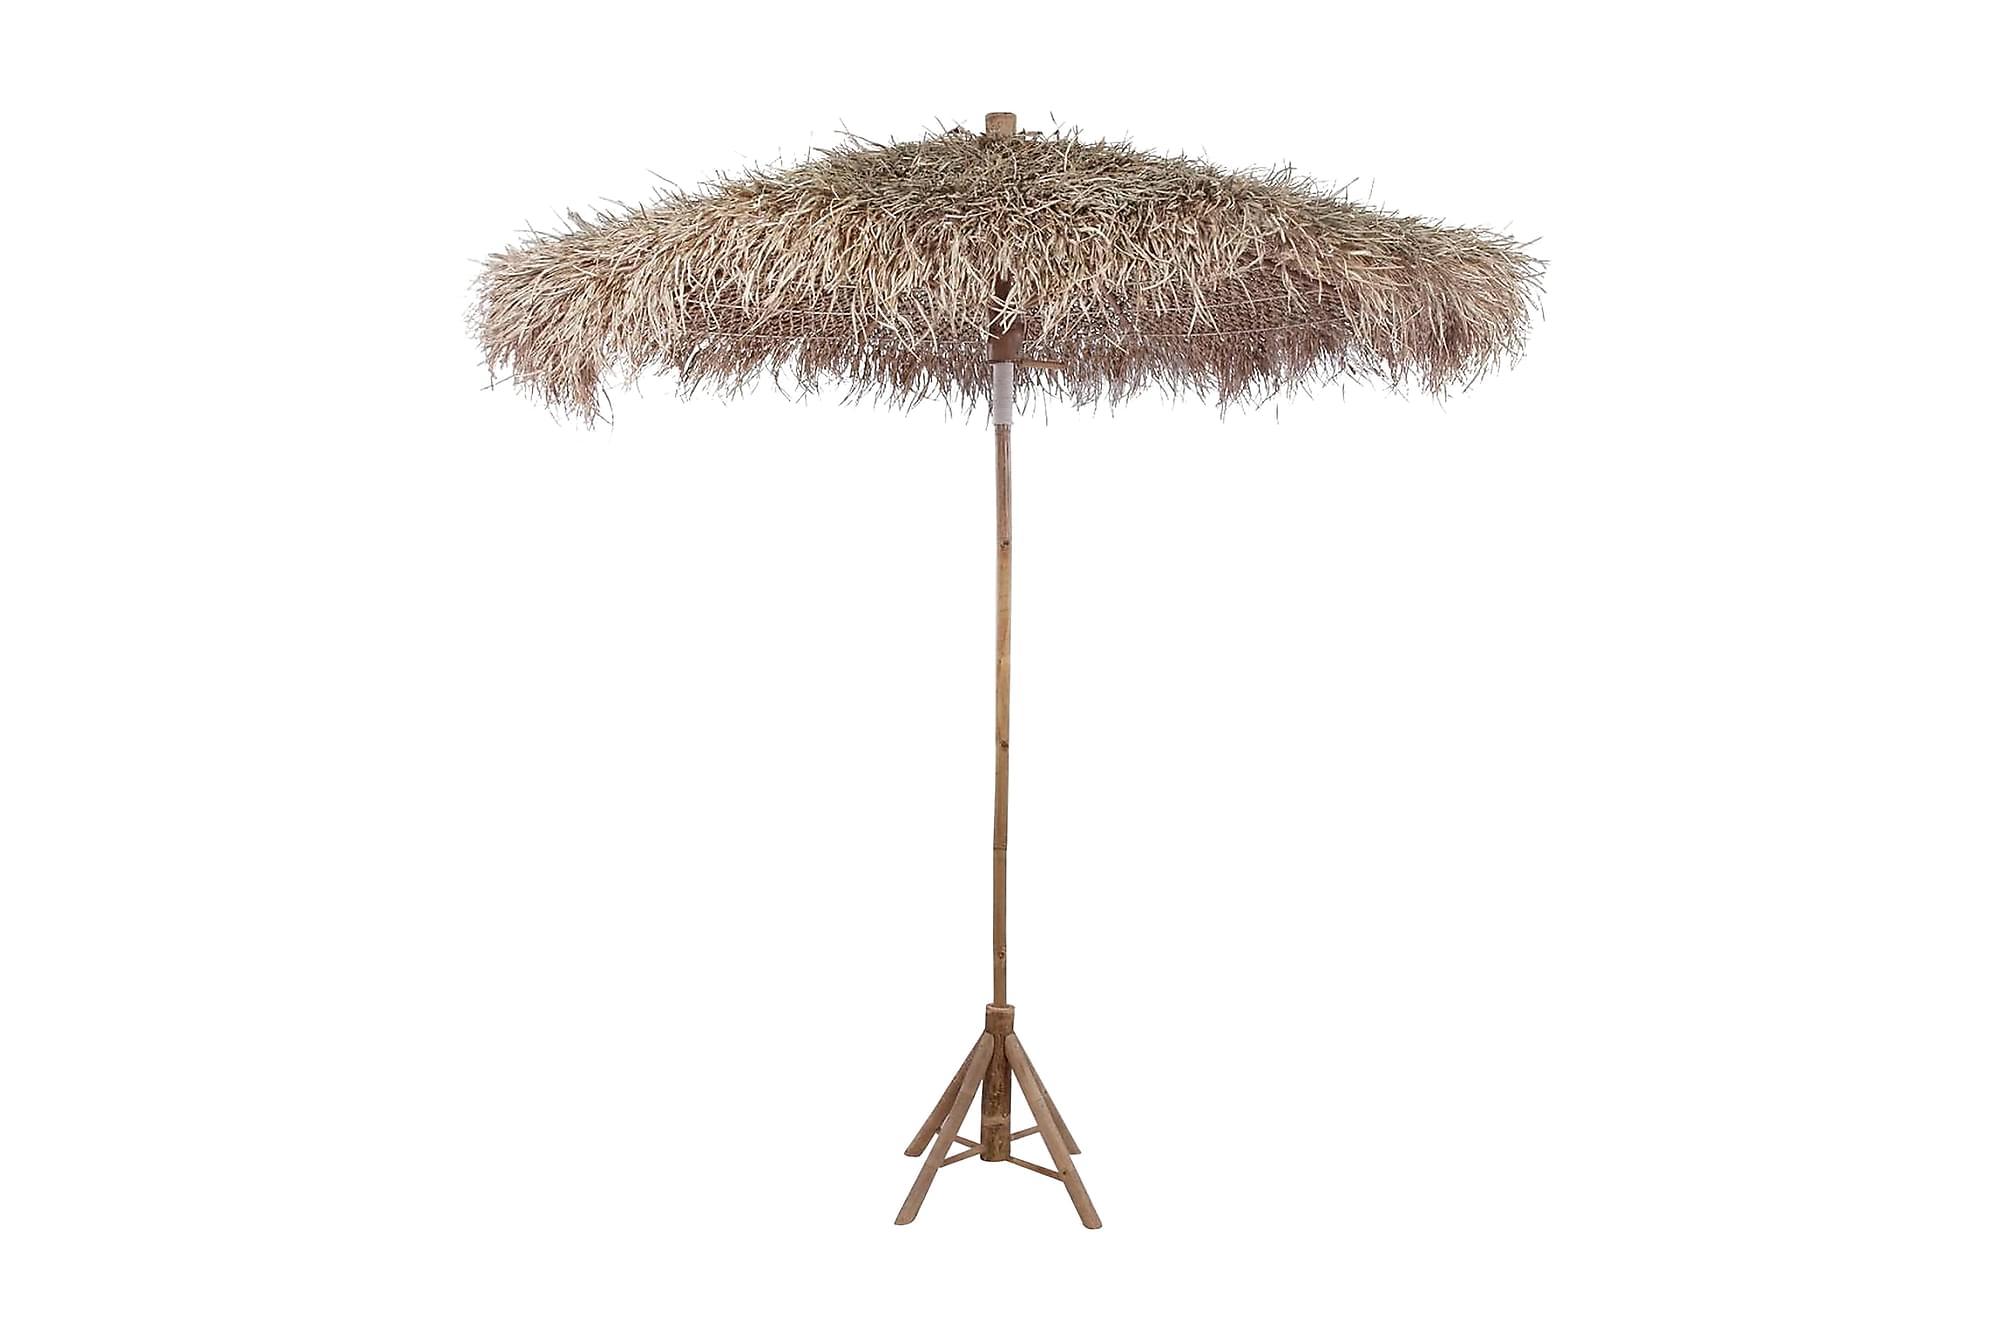 Bambuparasoll med bananbladstak 210 cm, Parasoll